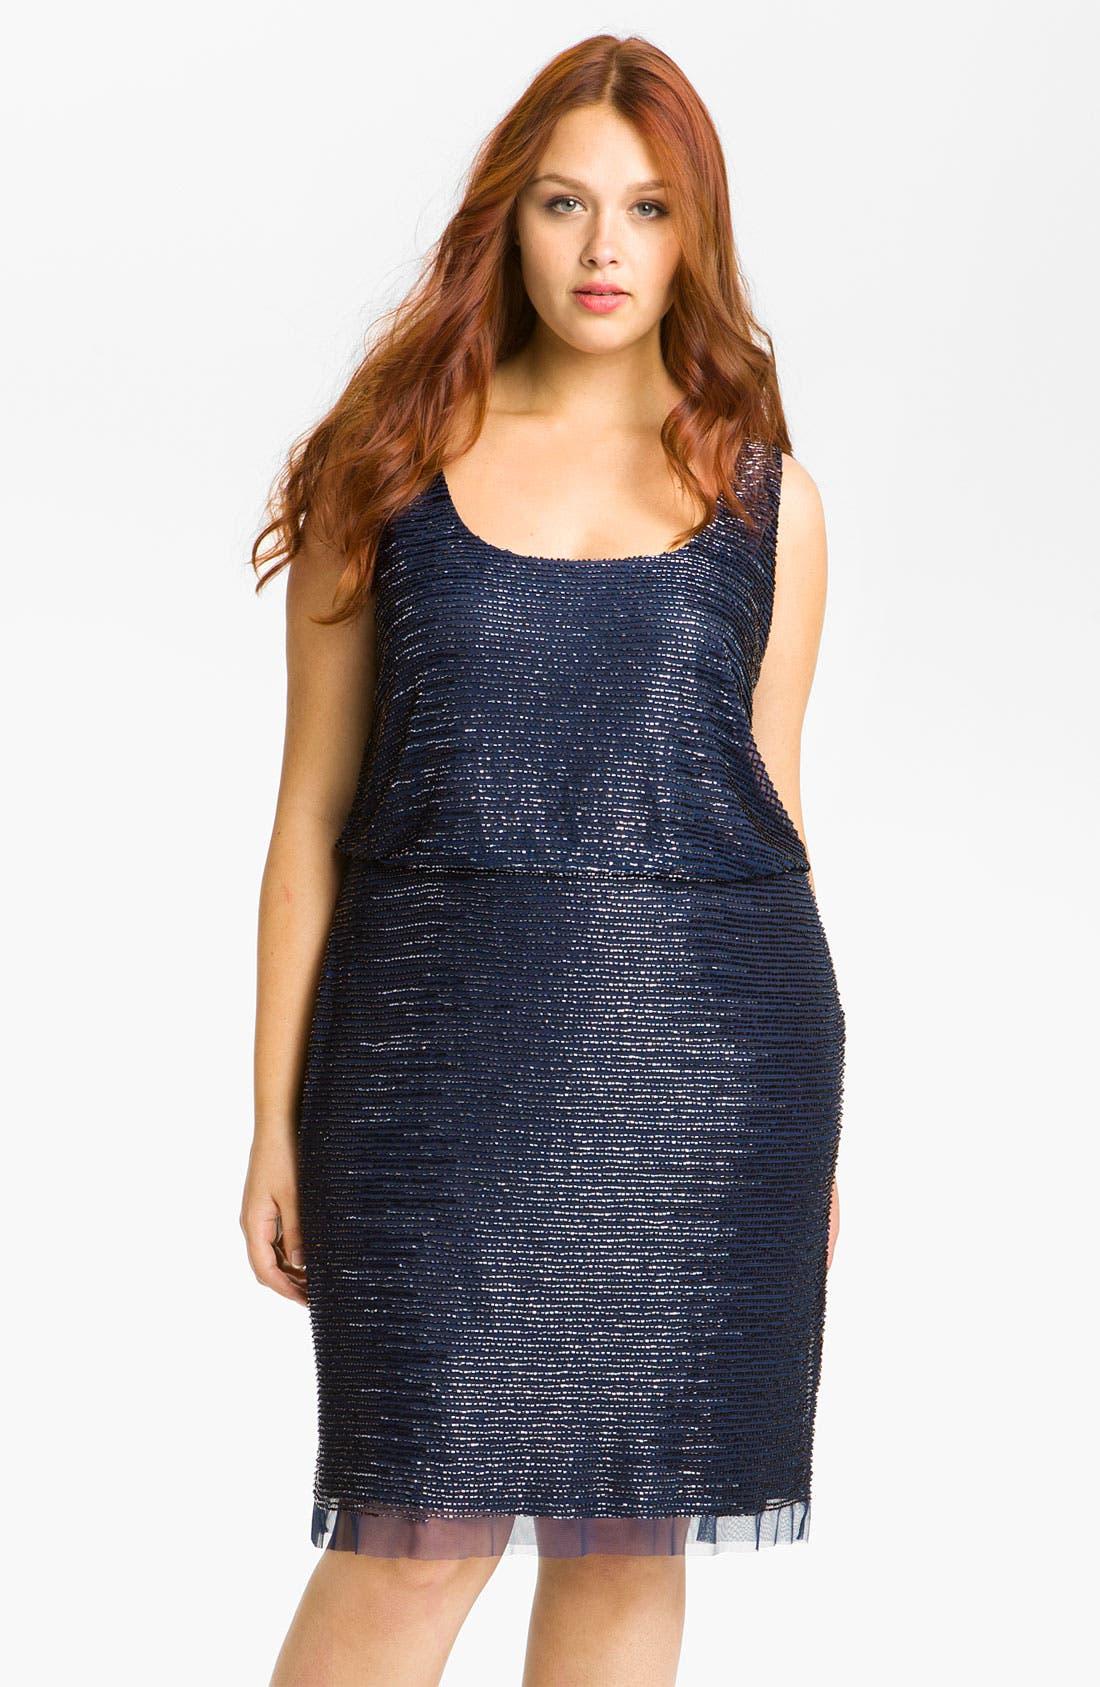 Alternate Image 1 Selected - Adrianna Papell Beaded Blouson Dress (Plus)